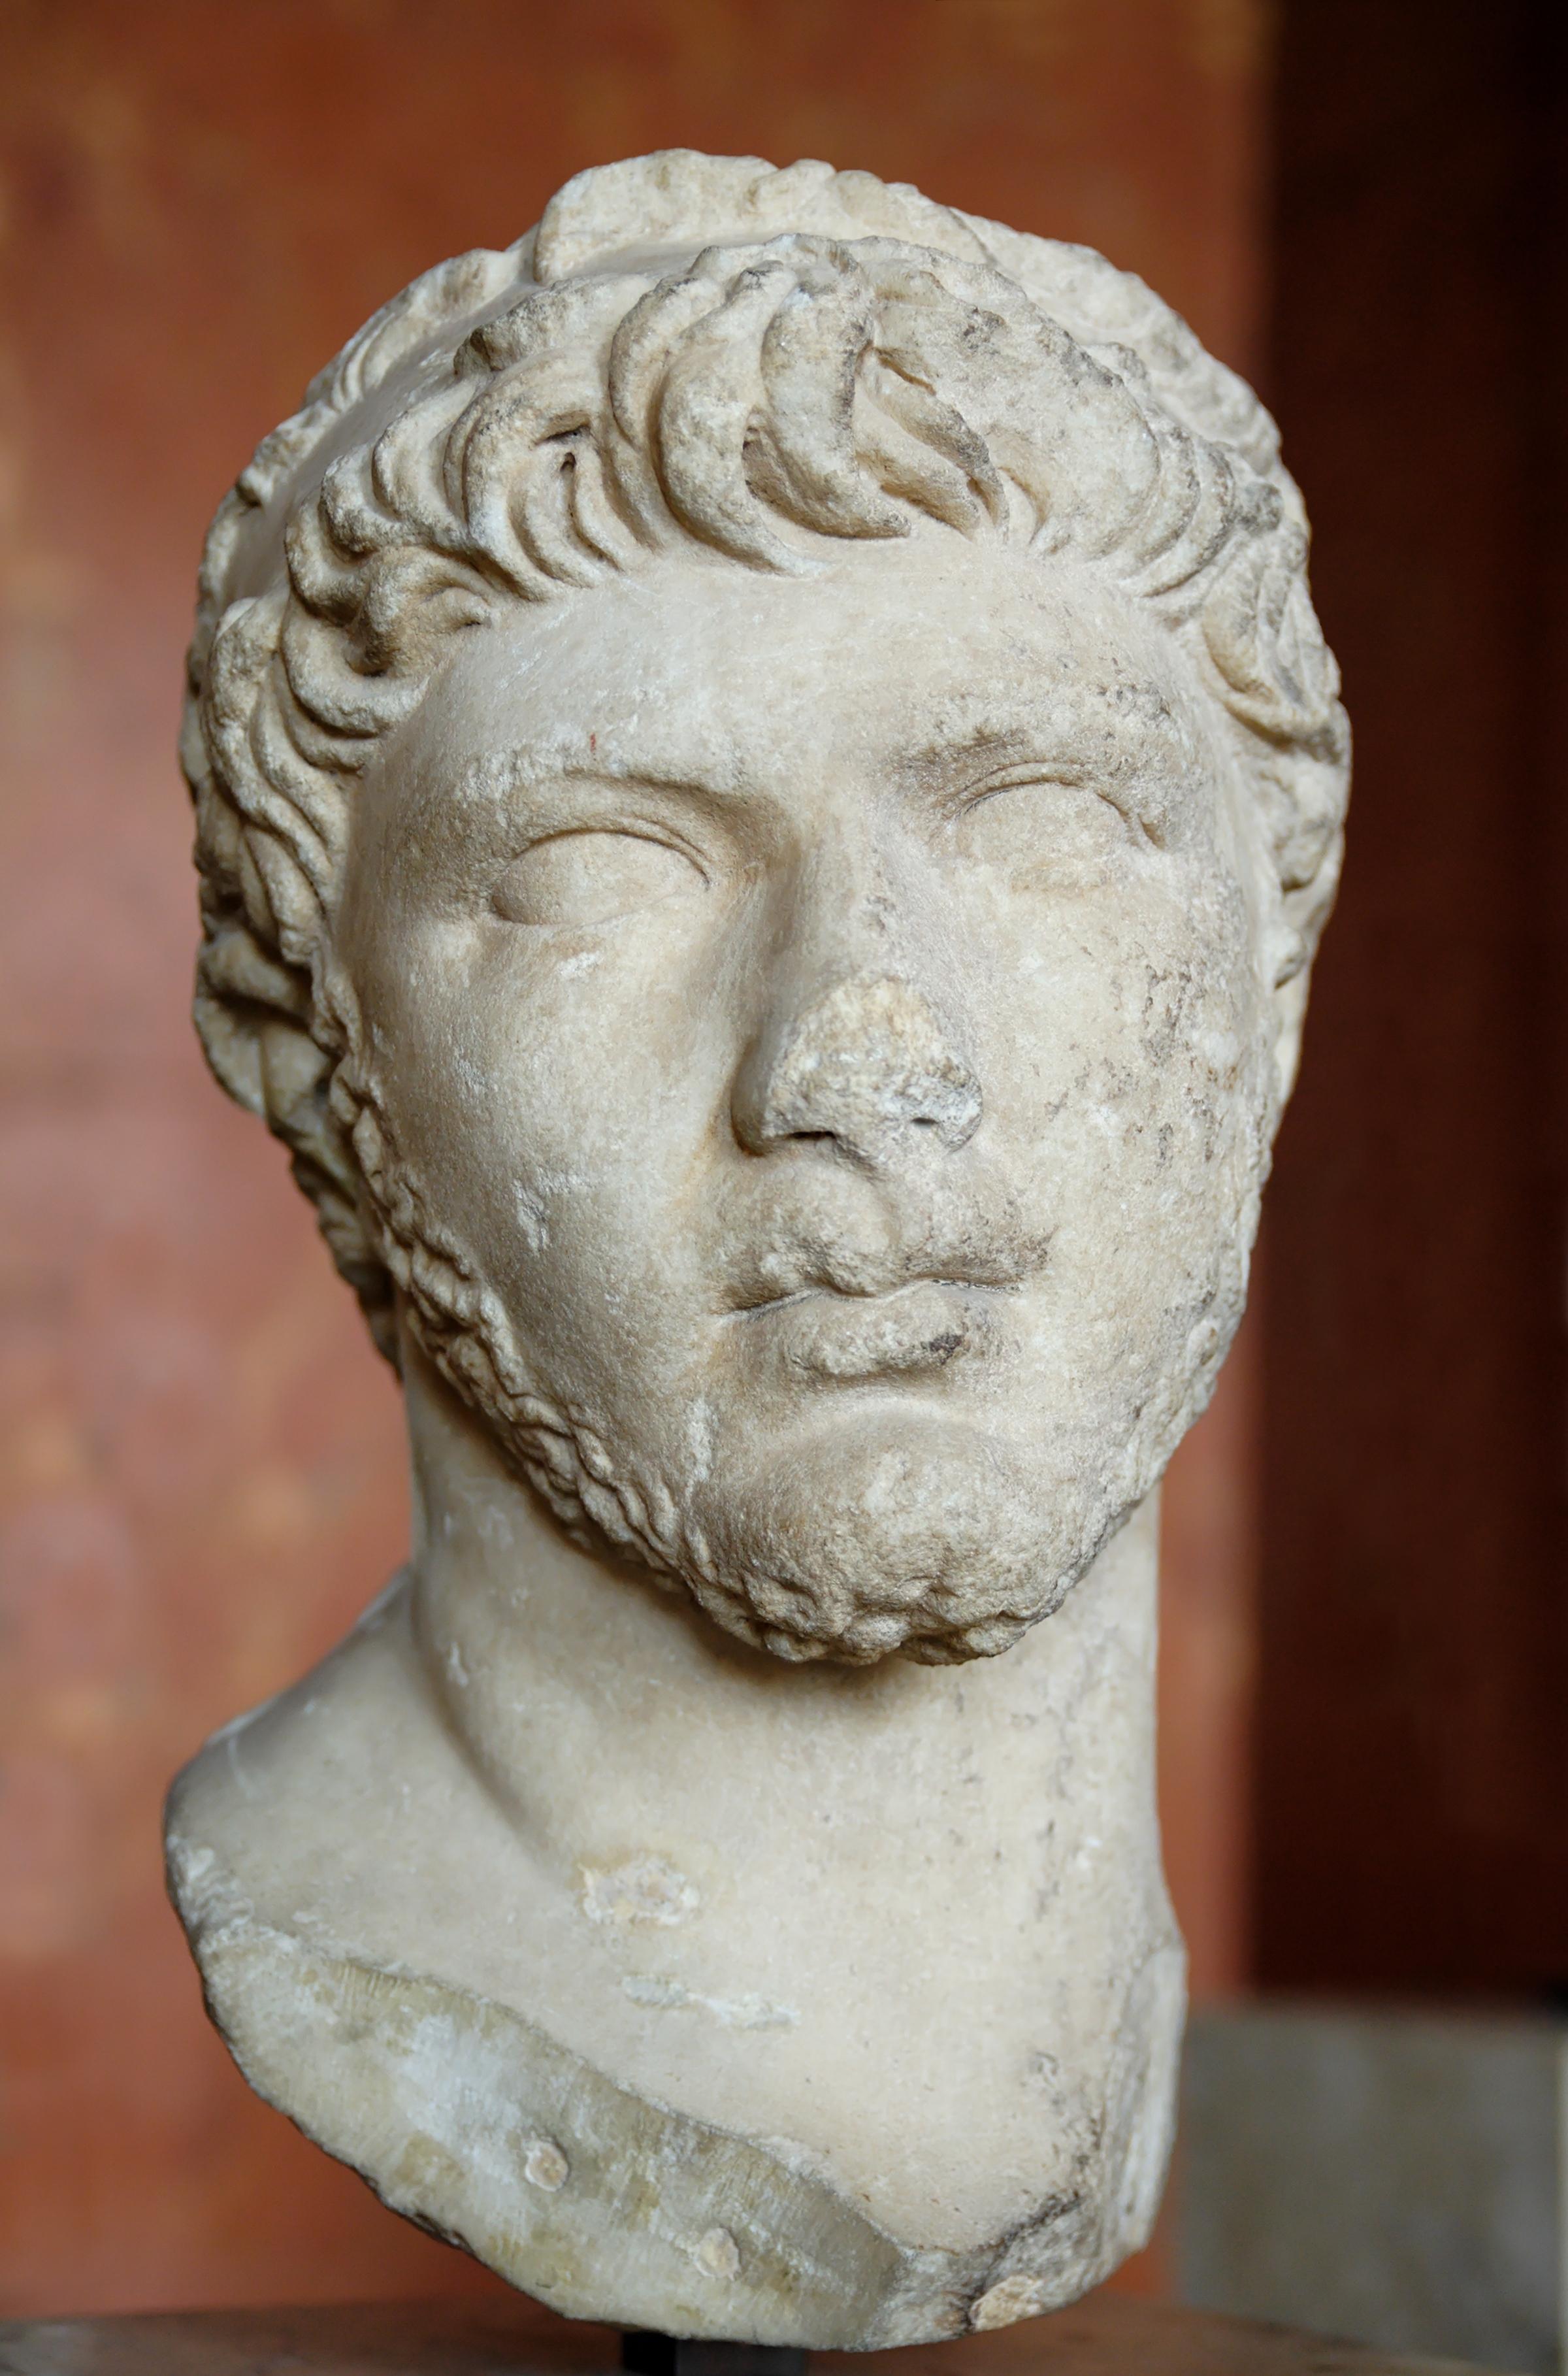 Why was Ptolemy of Mauretania Murdered by Caligula?